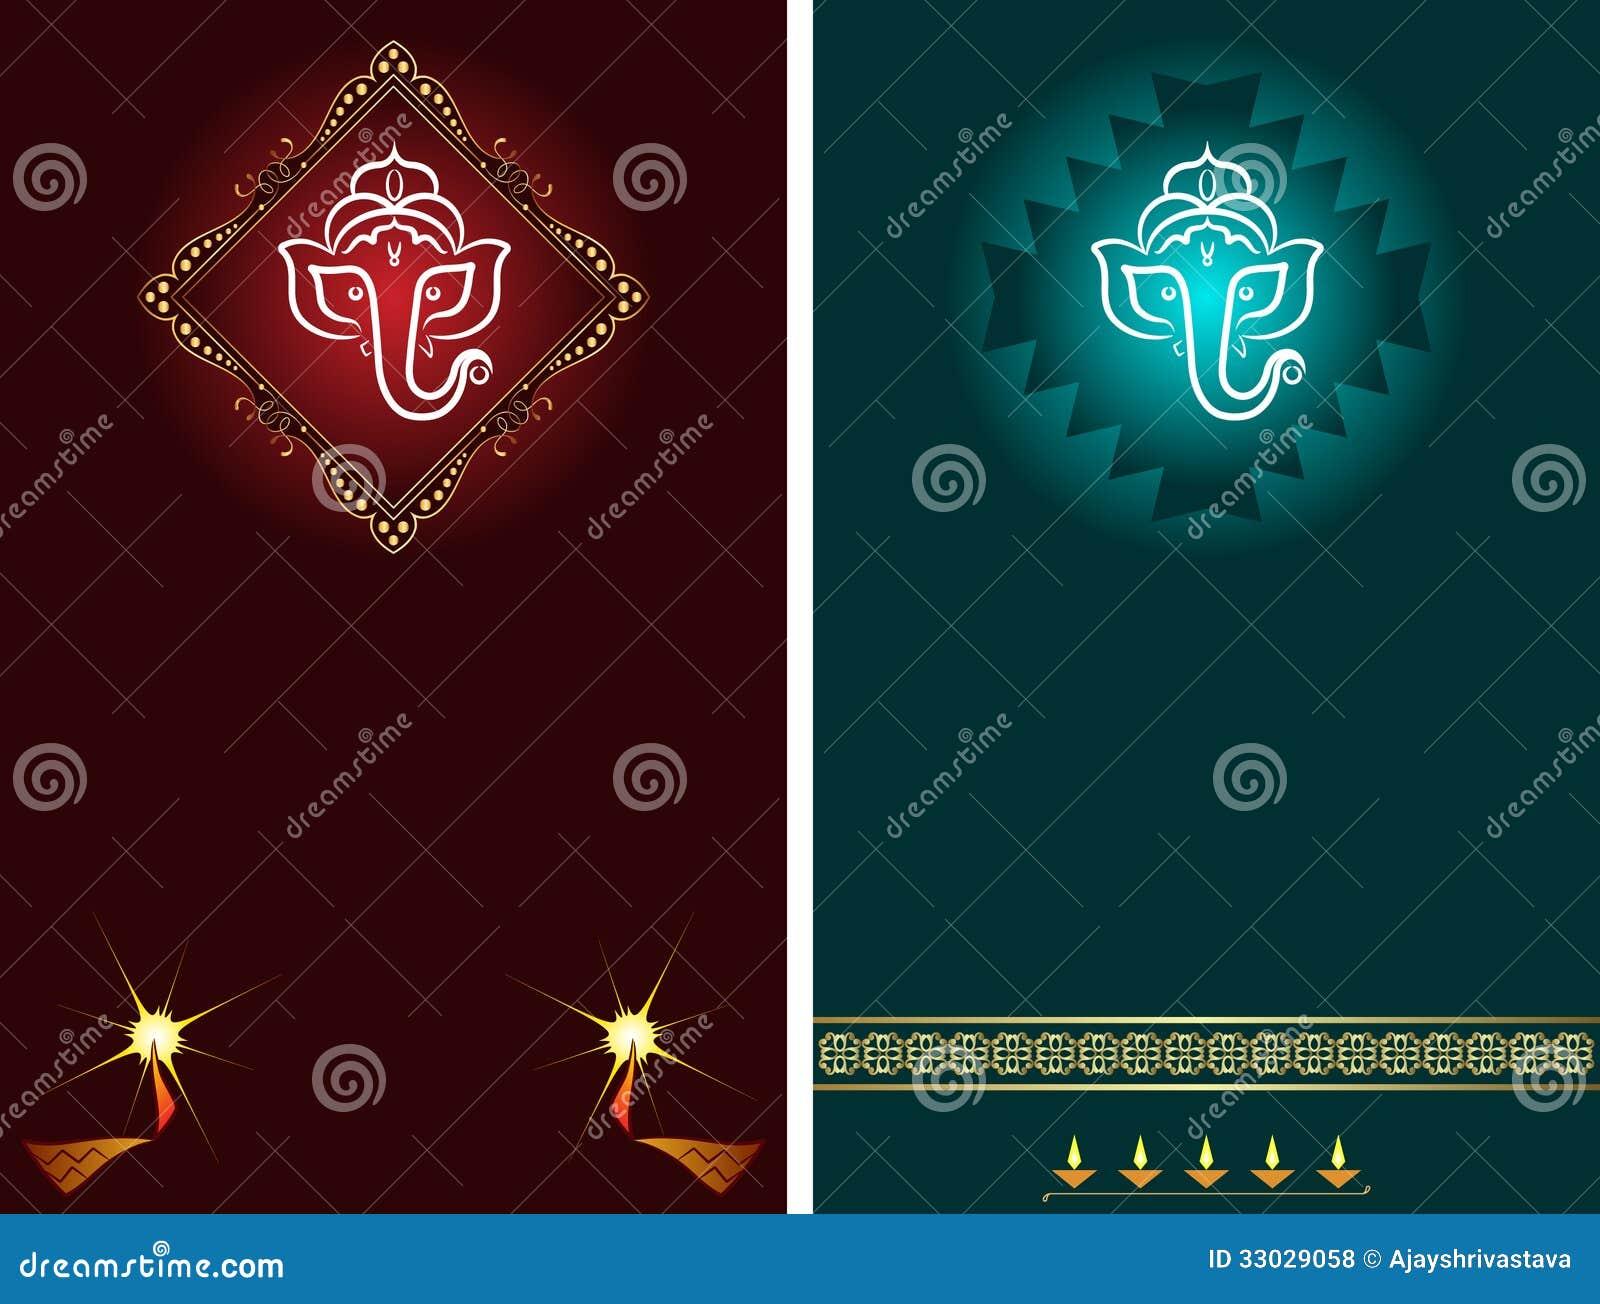 Ganesha diwali greeting stock illustration illustration of icon ganesha diwali greeting icon culture kristyandbryce Images